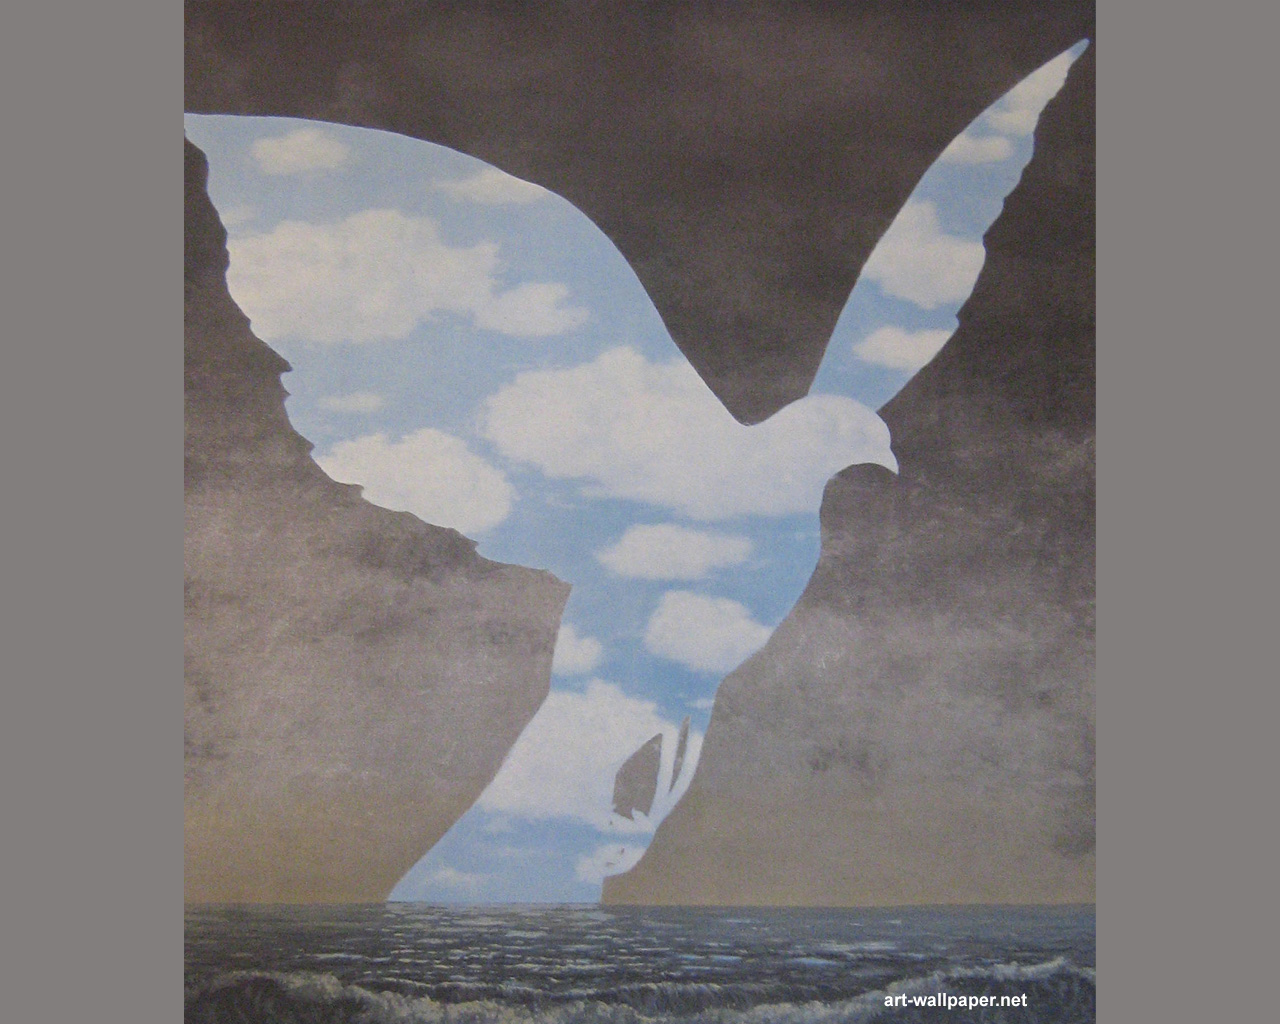 Rene Magritte Wallpaper Paintings Art Wallpapers 1280x1024